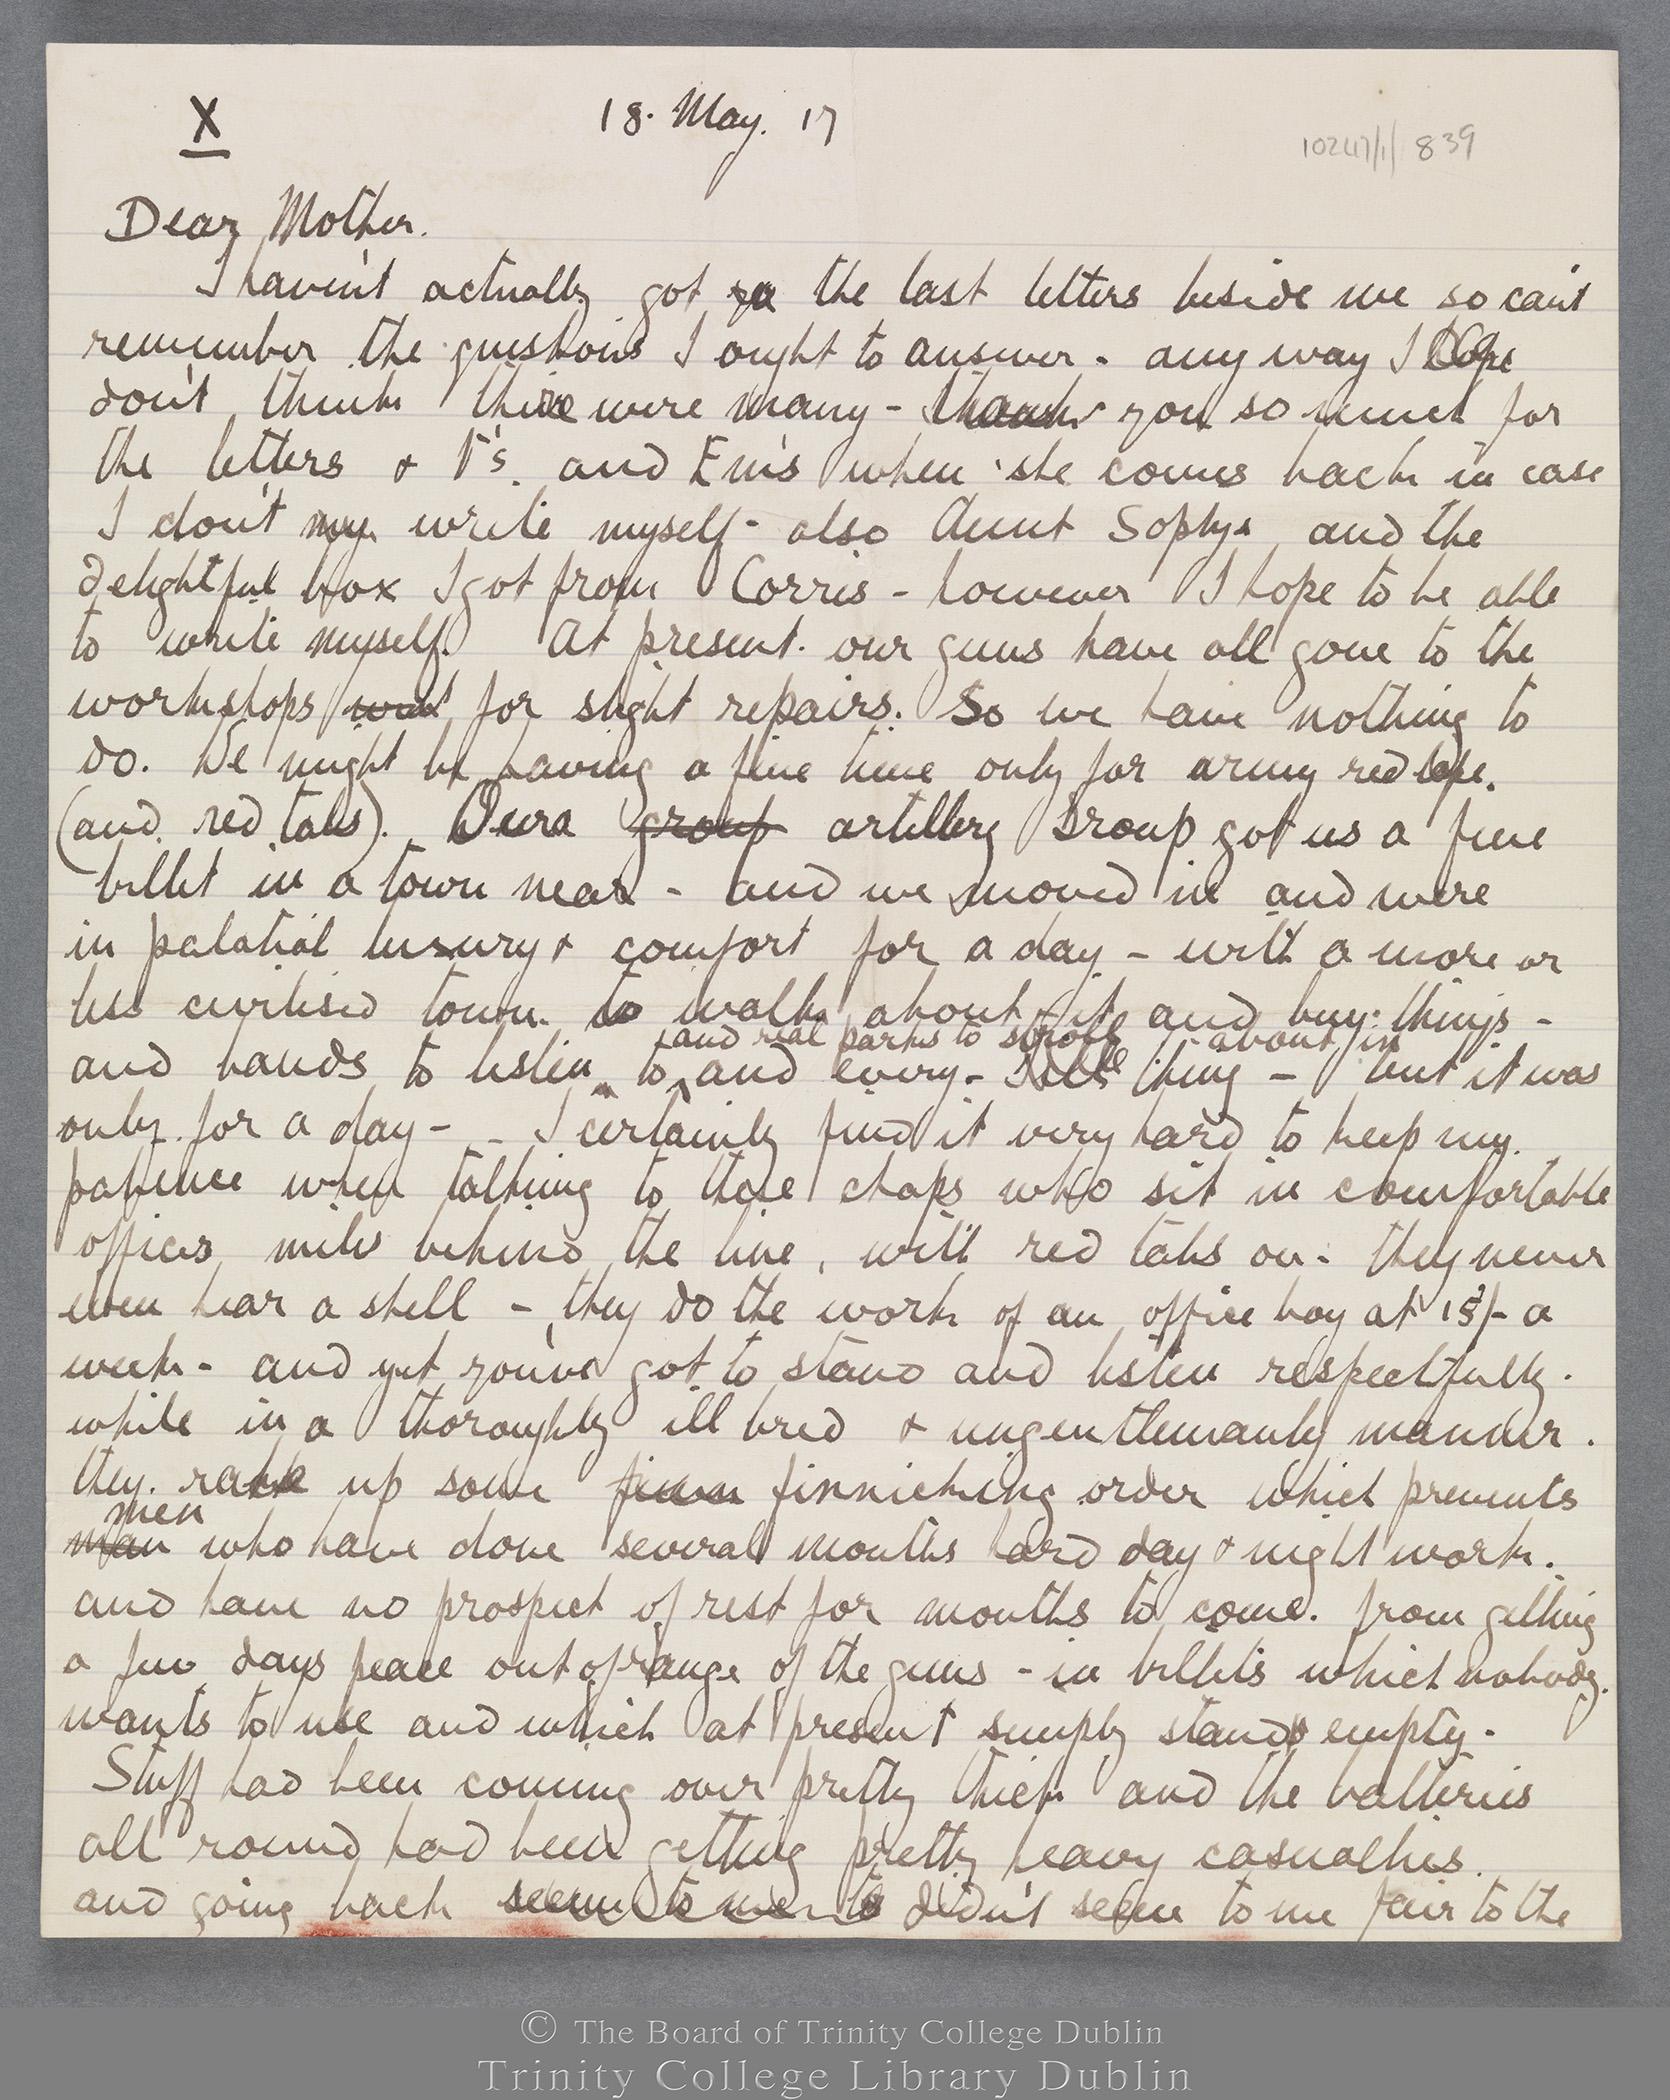 TCD MS 10247/1/839 folio 1 recto